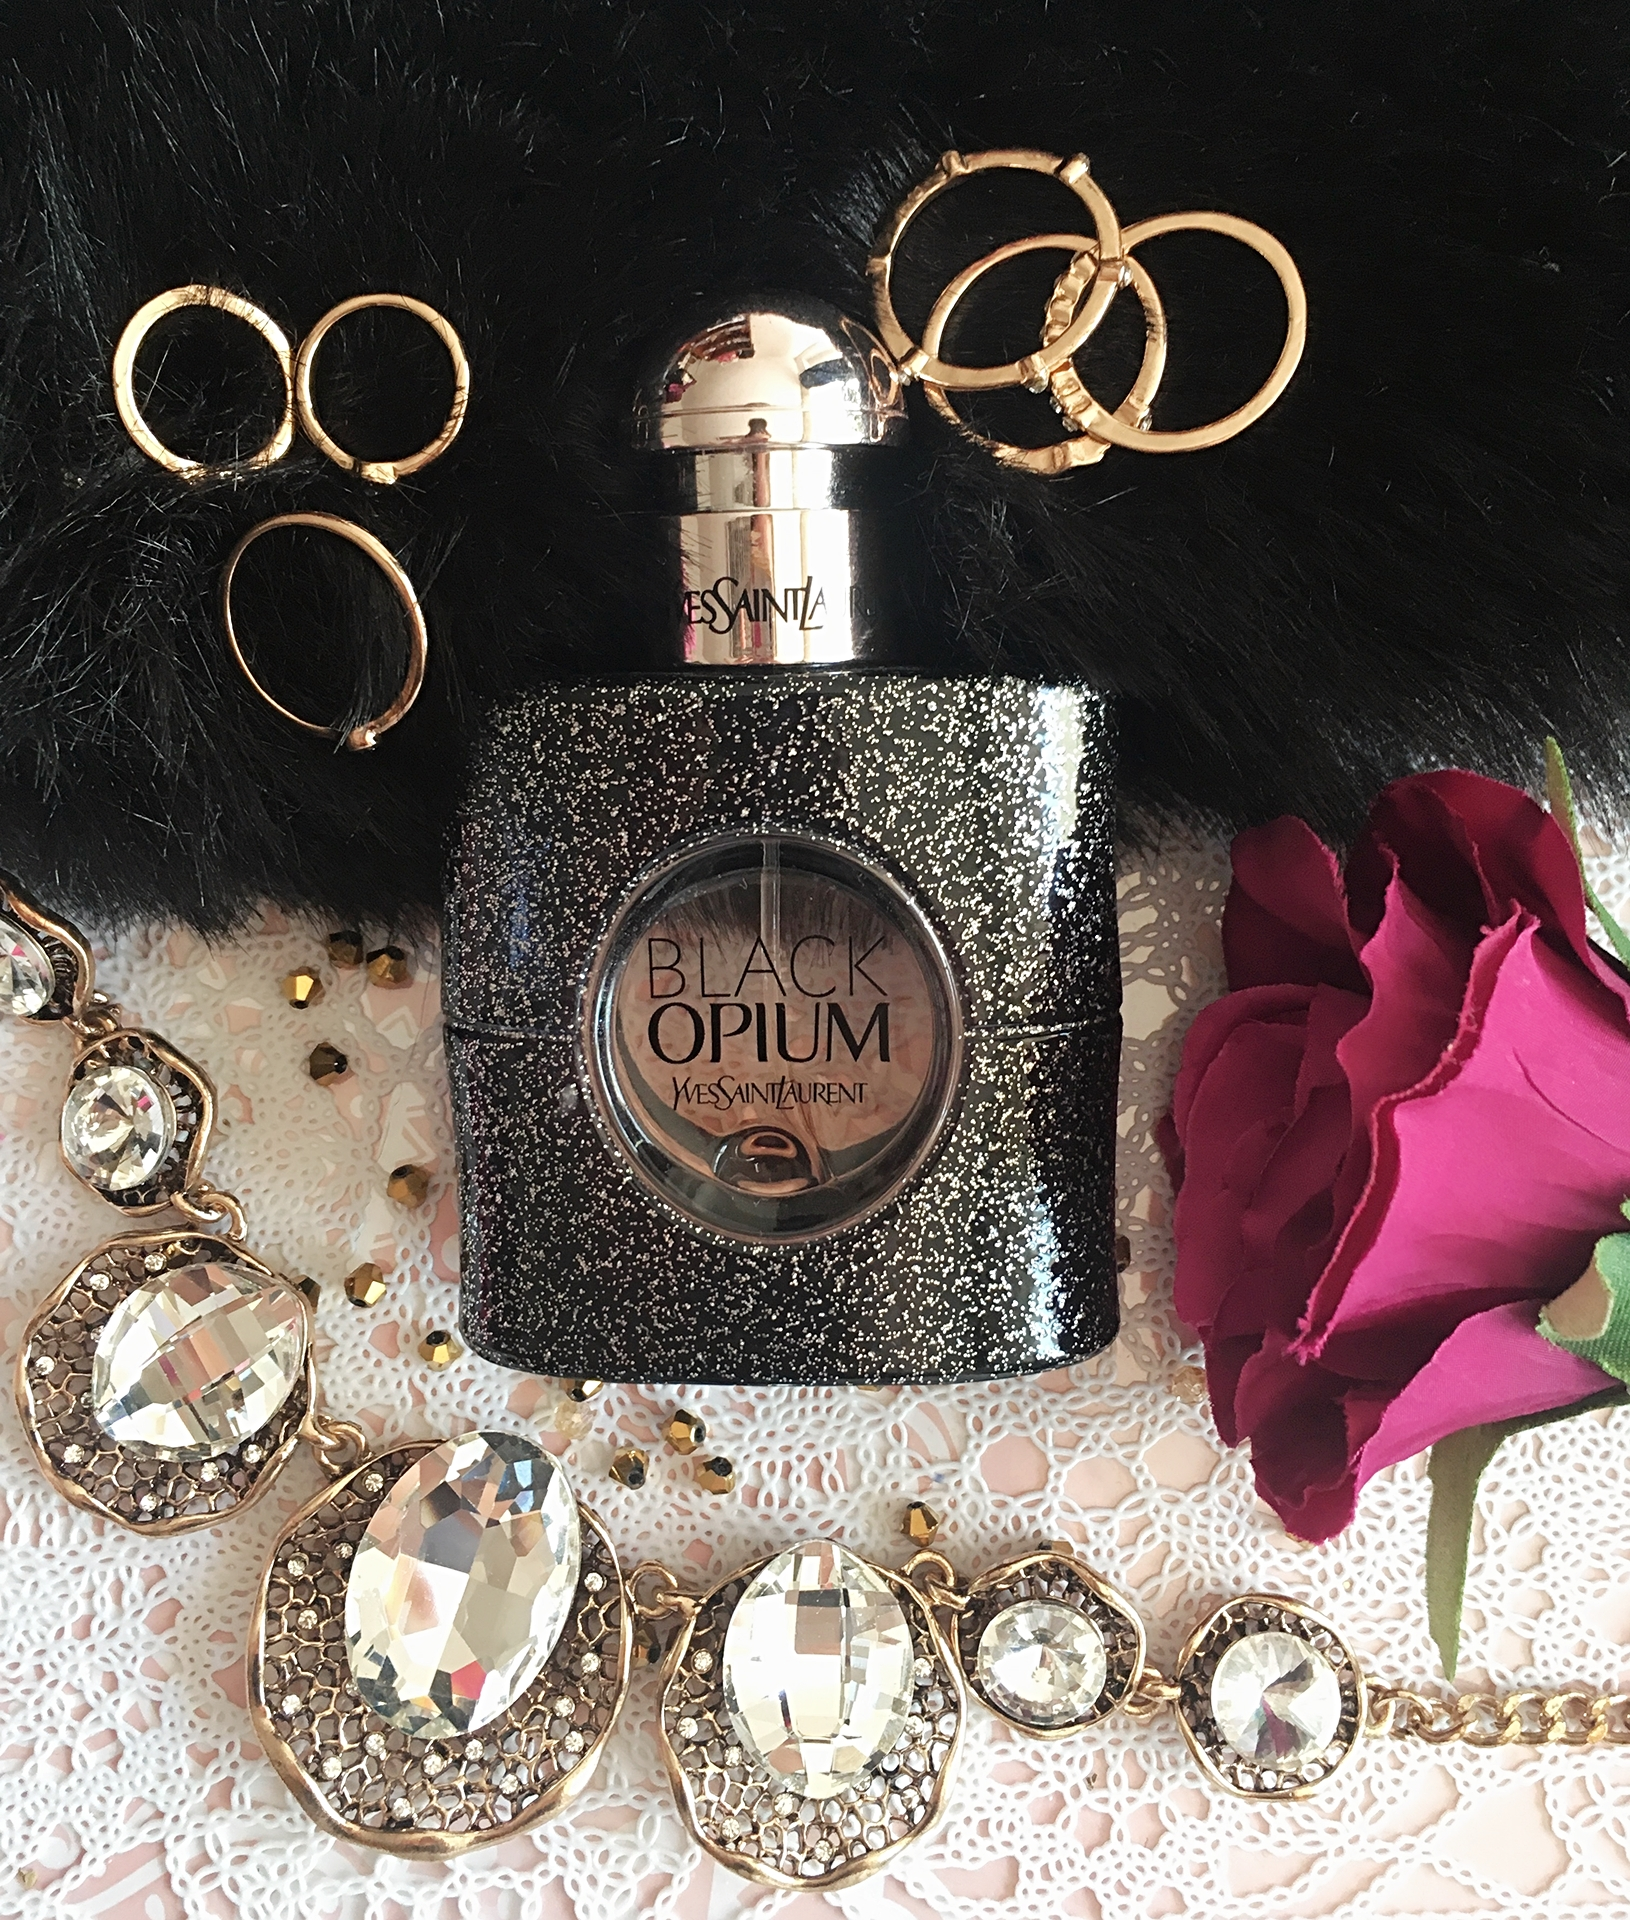 aoro notino black friday yves saint laurent black opium